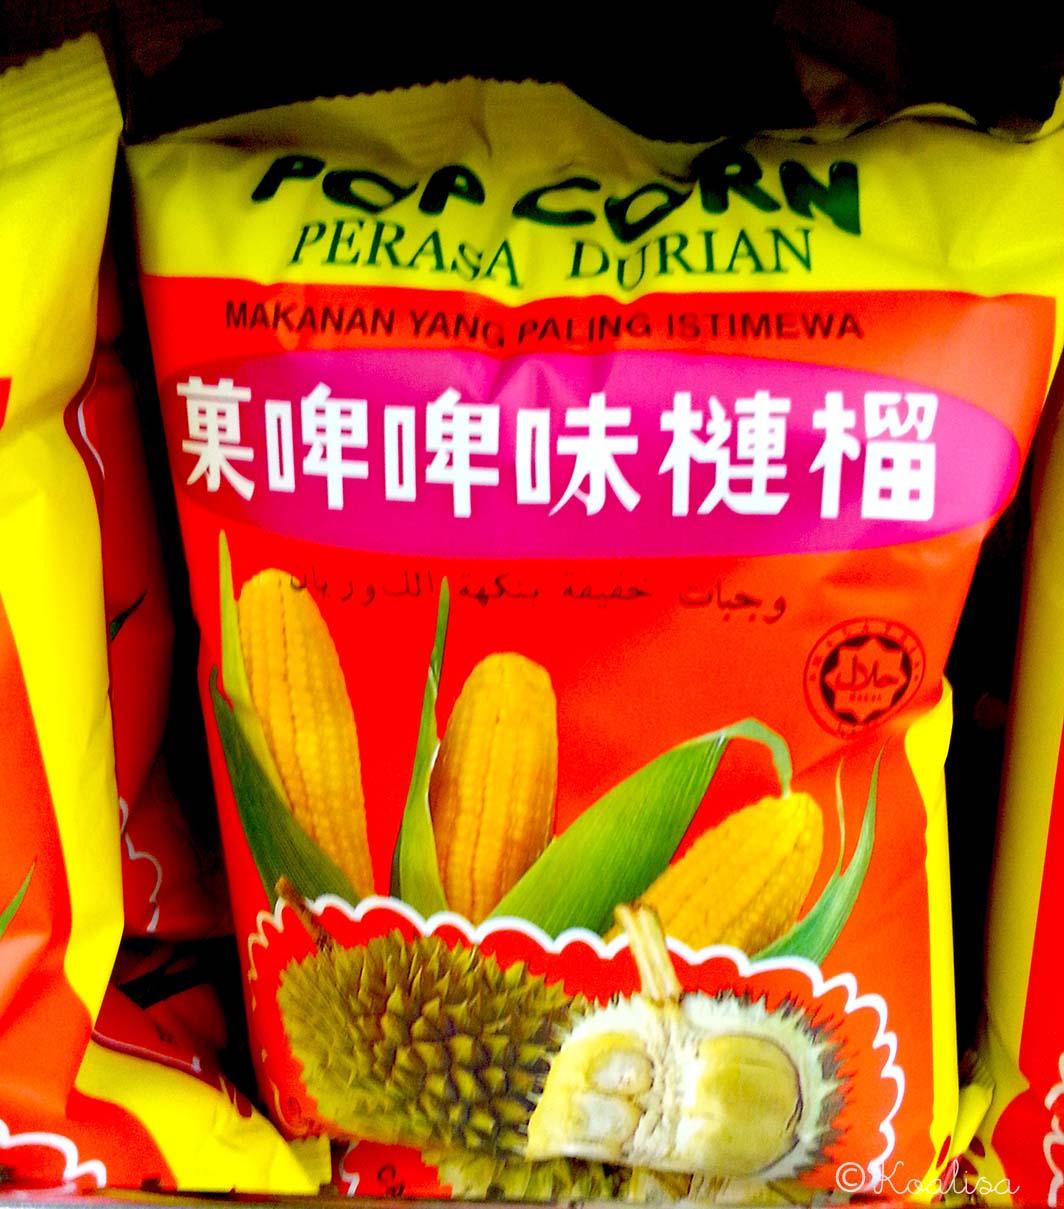 popcorn durian